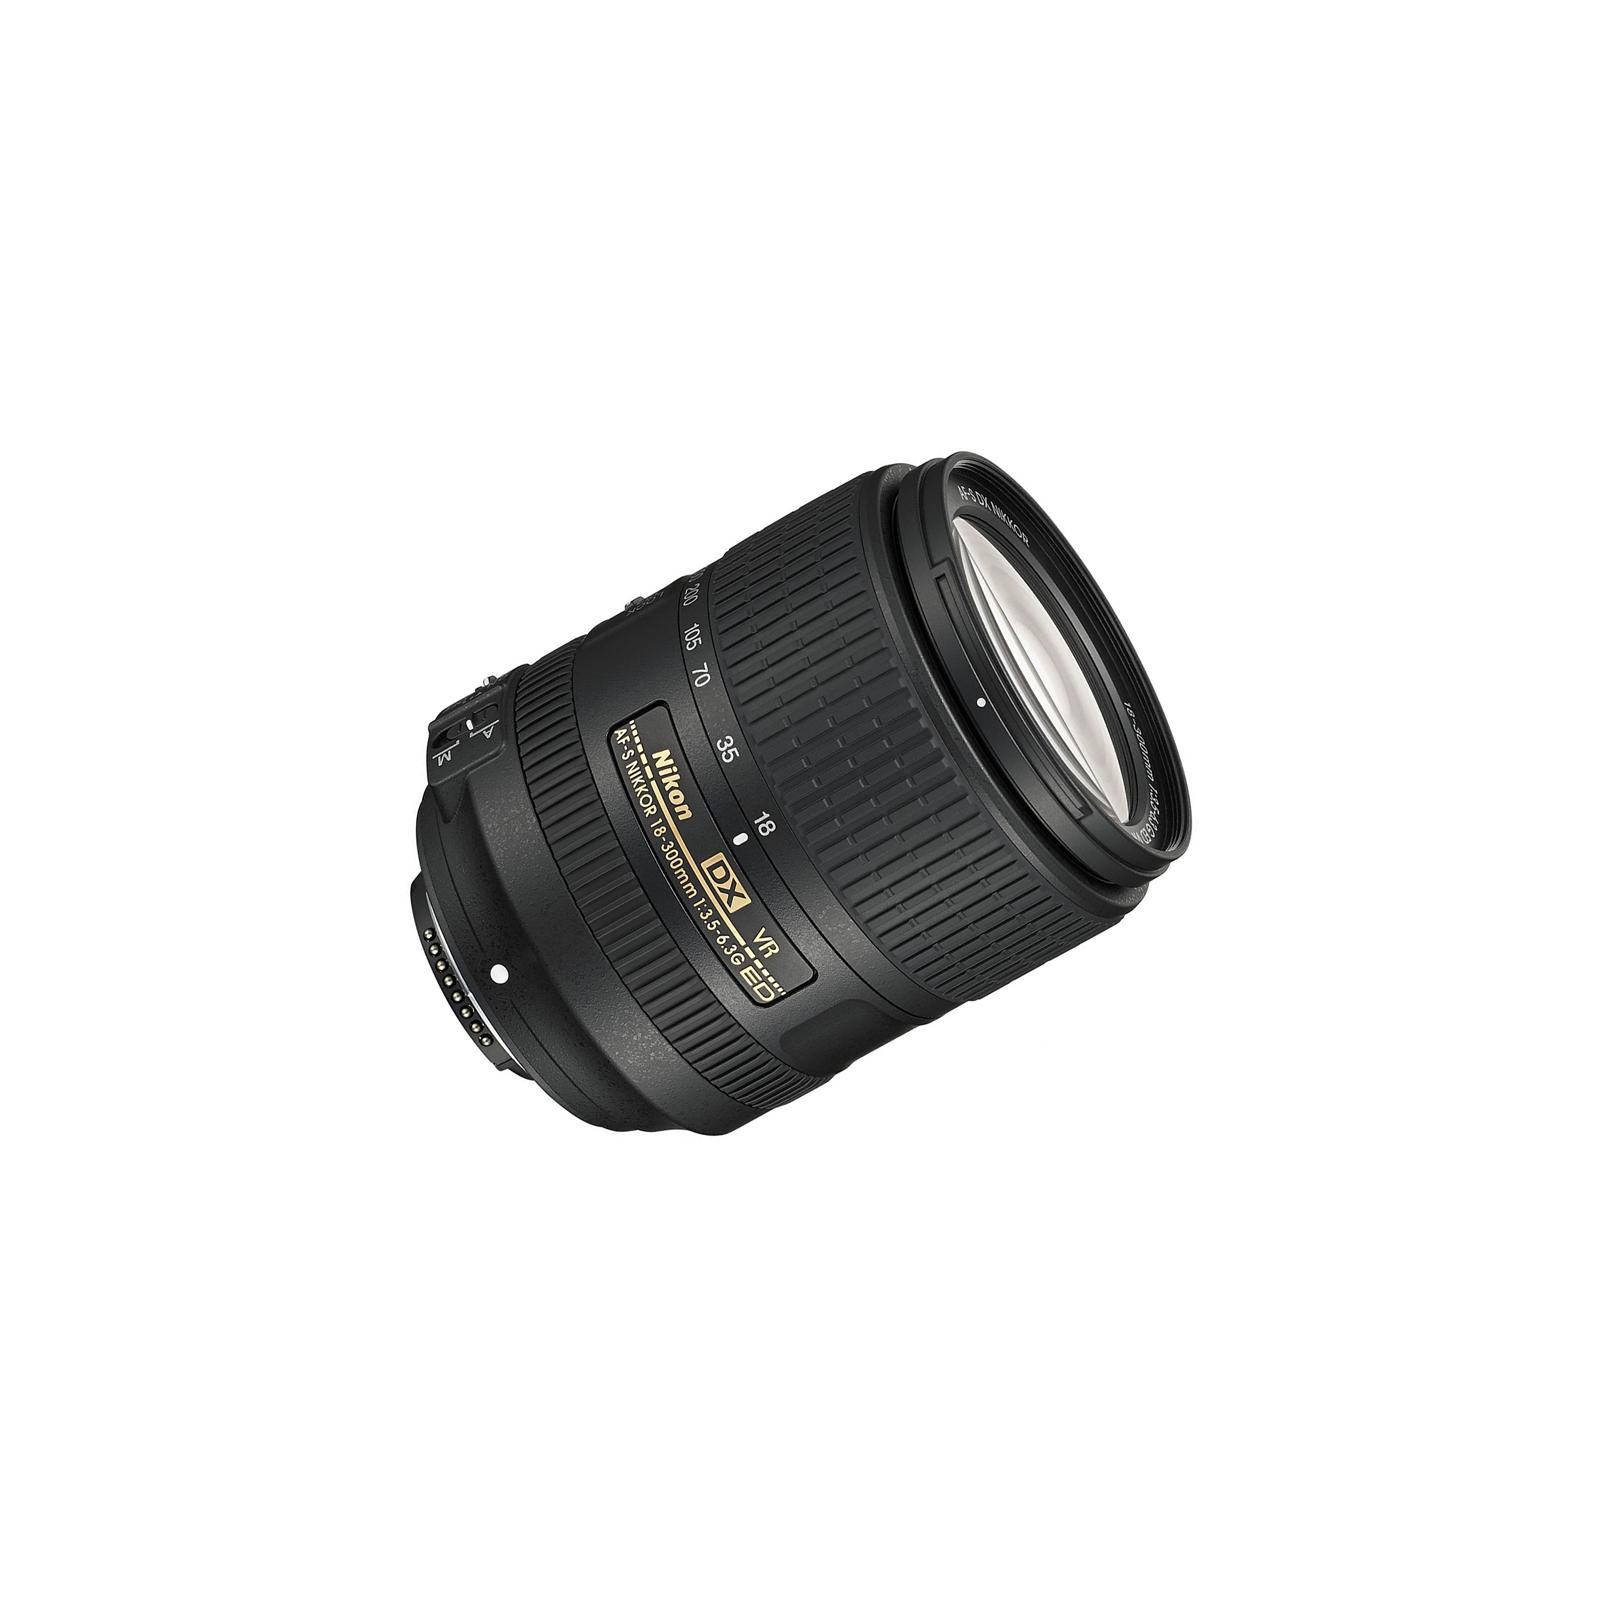 Объектив Nikon 18-300mm f/3.5-6.3G ED AF-S DX VR (JAA821DA) изображение 3